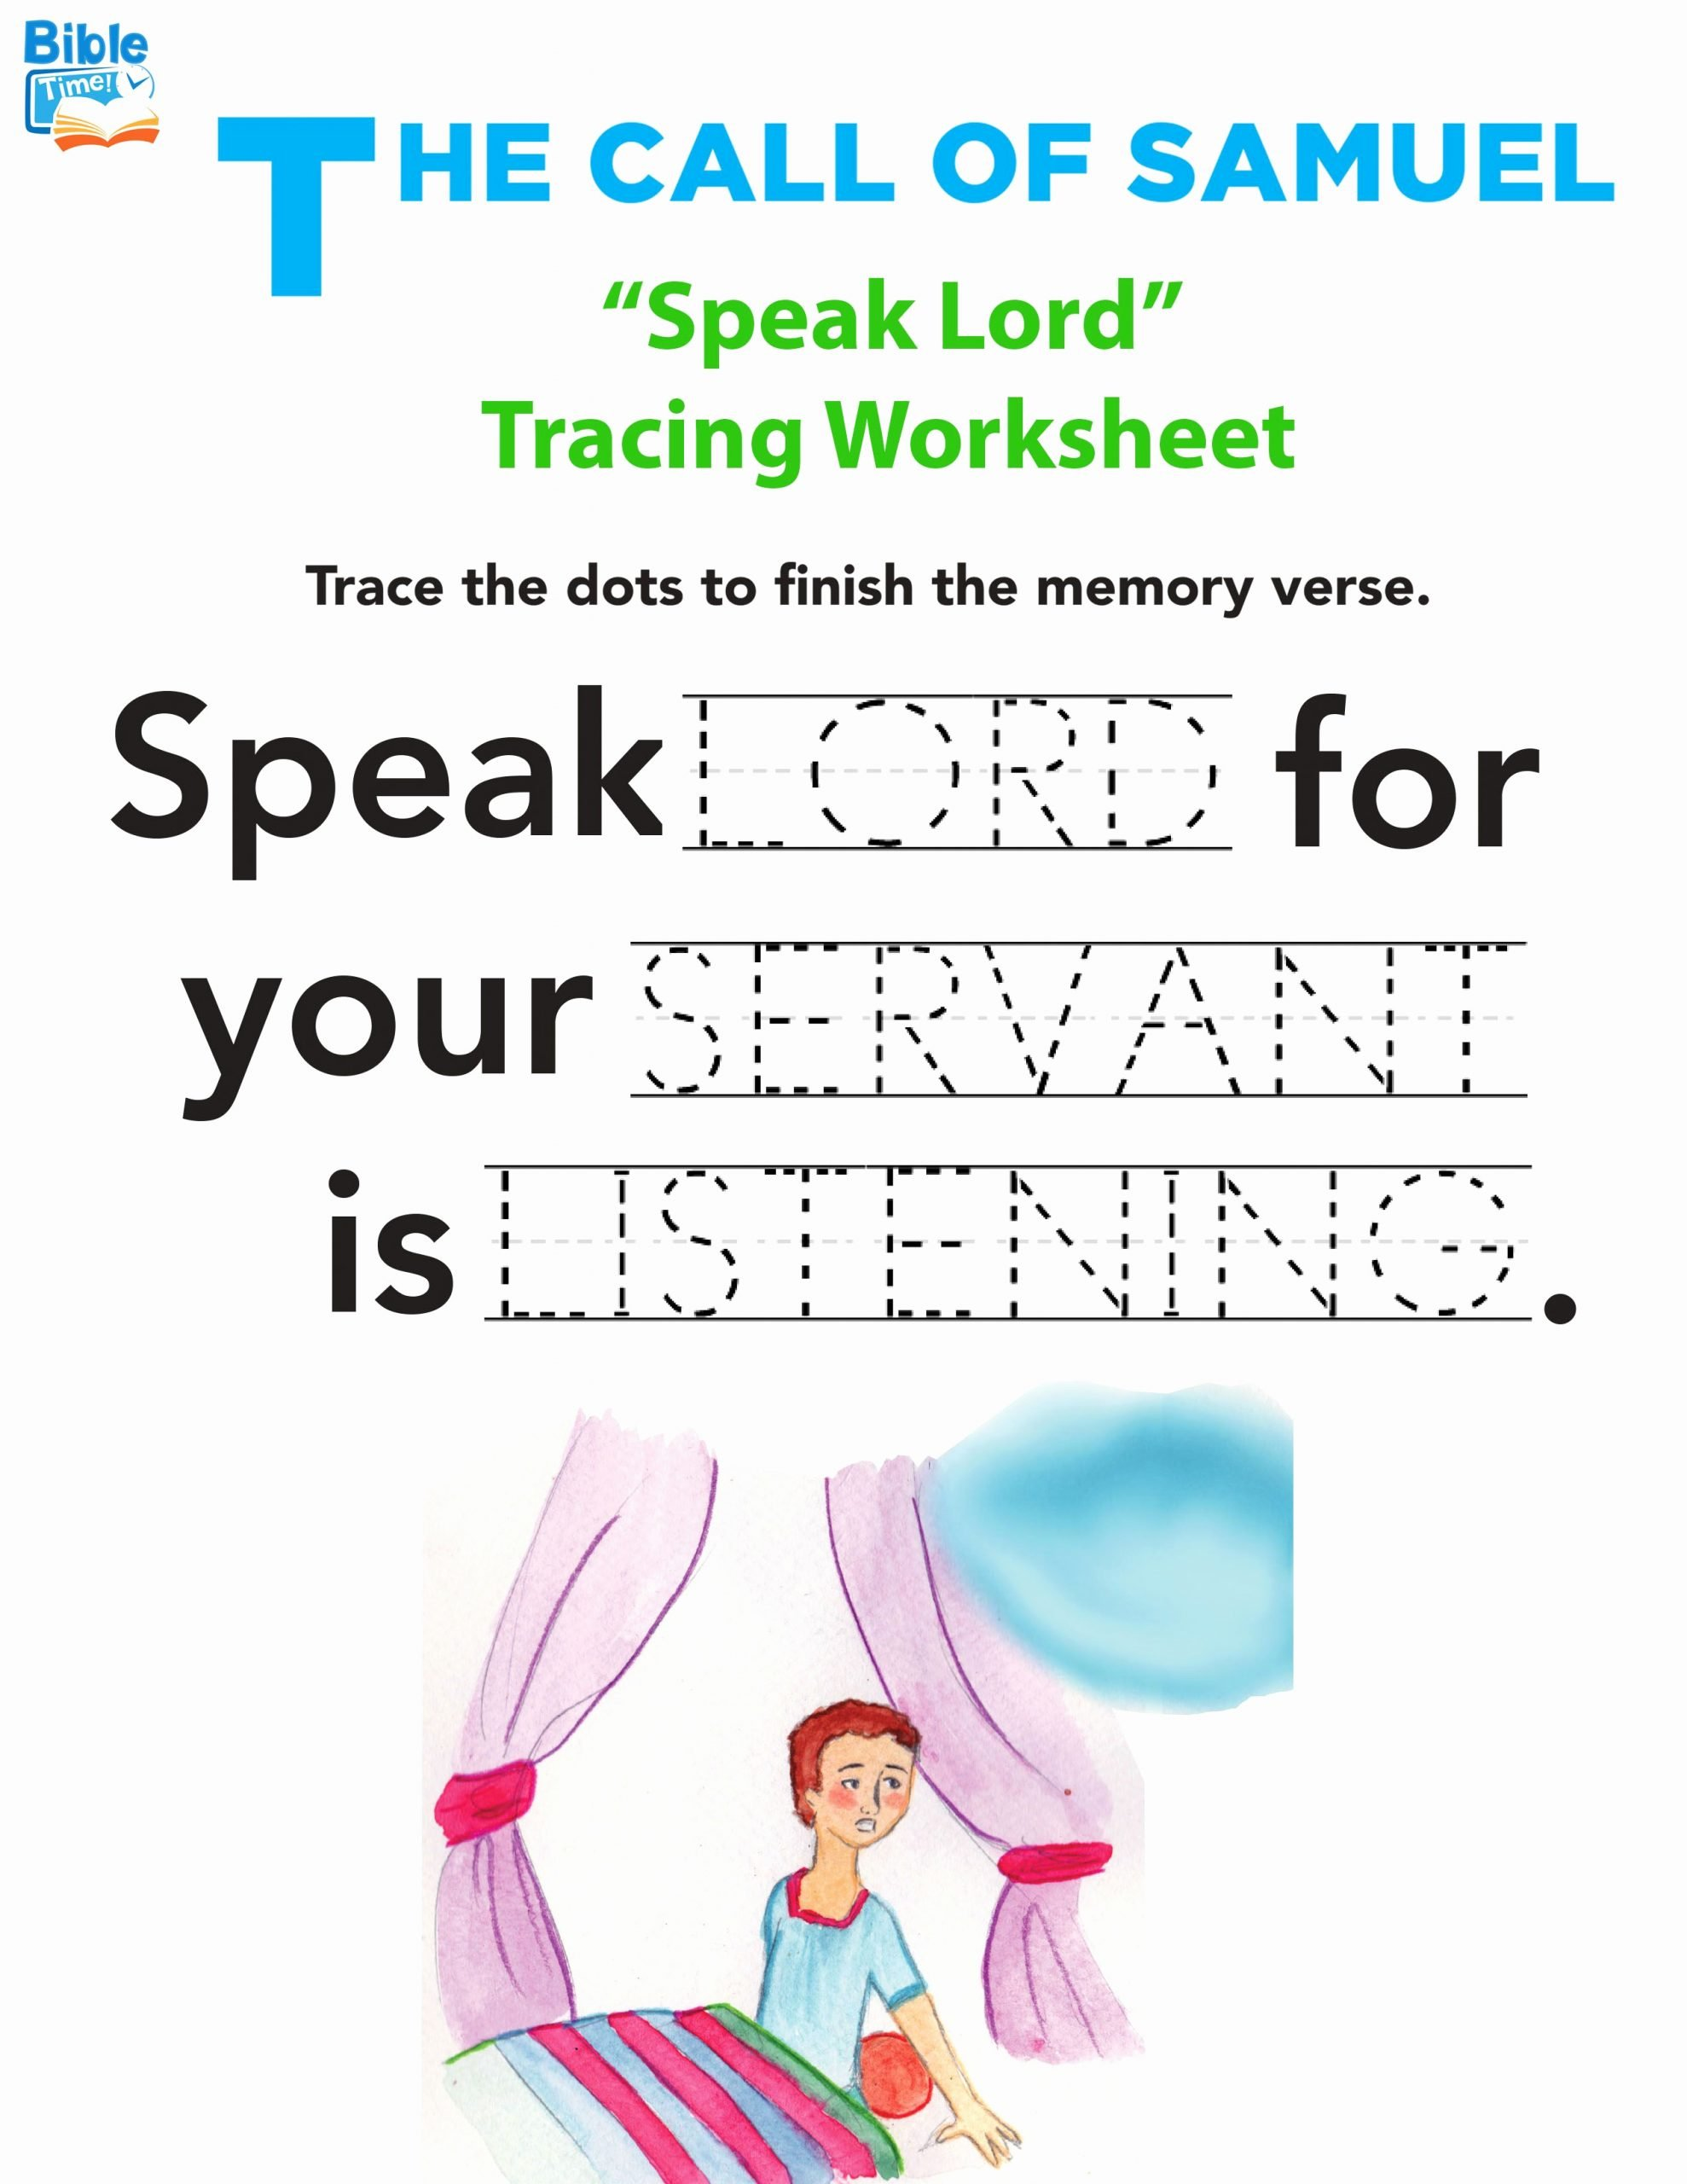 Bible Story Worksheets for Preschoolers Kids Free Tracing Worksheets for Preschool and Kindergarten